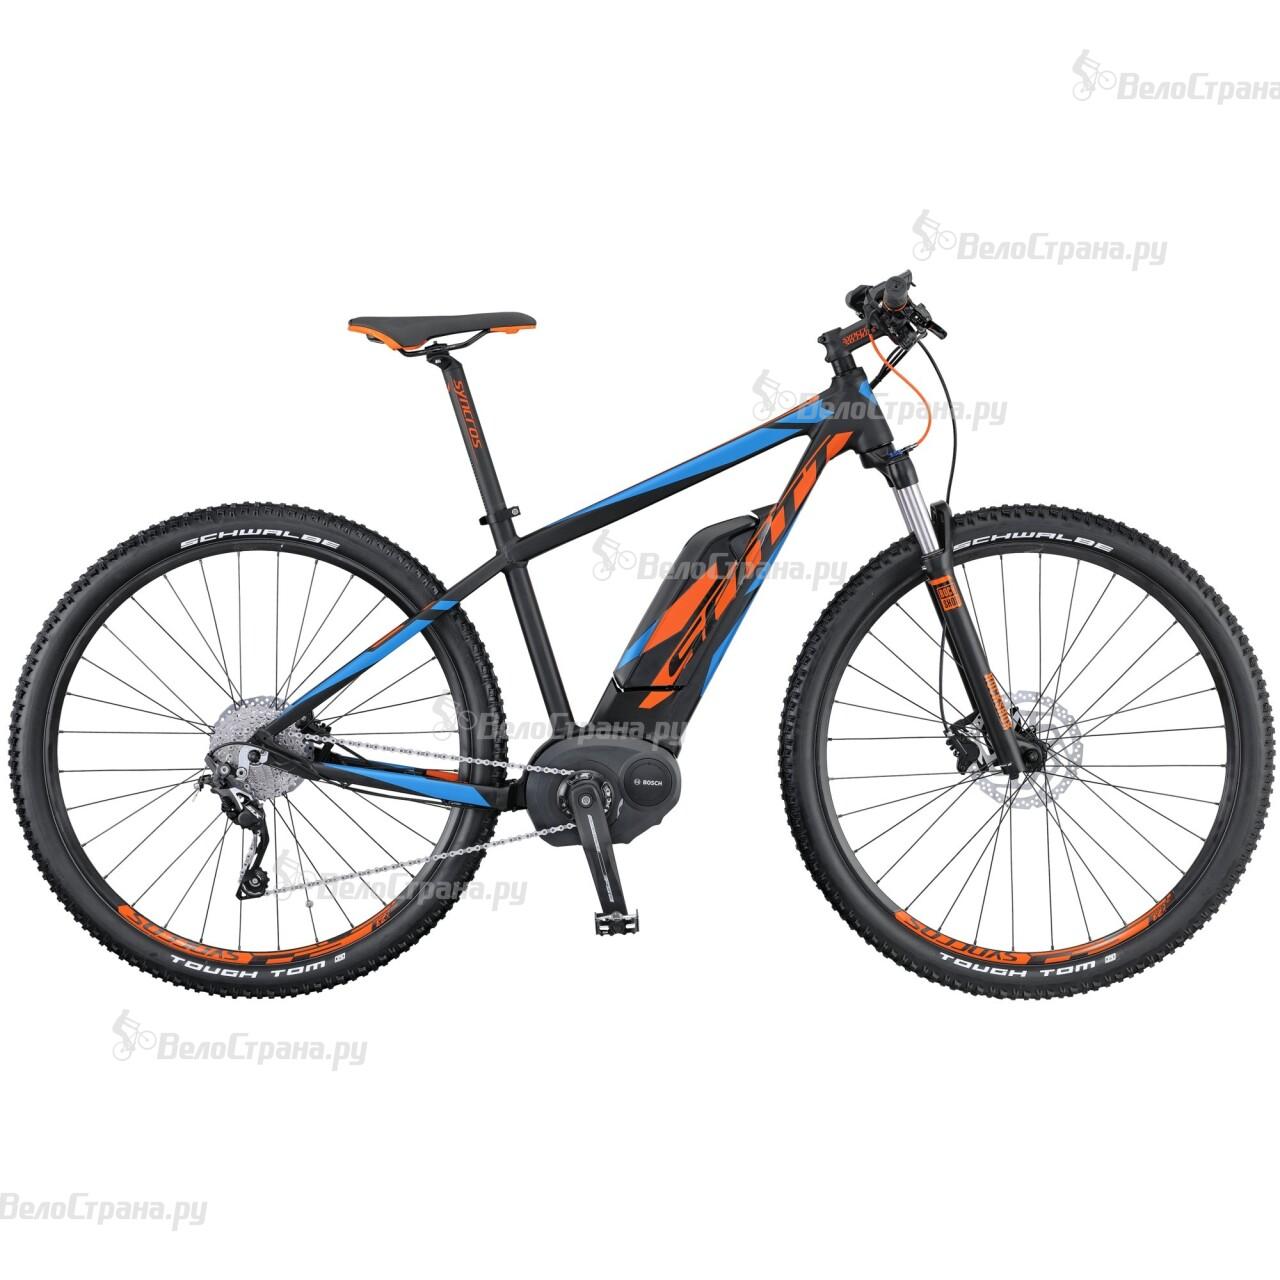 Велосипед Scott E-Aspect 920 (2016) scott aspect 900 2016